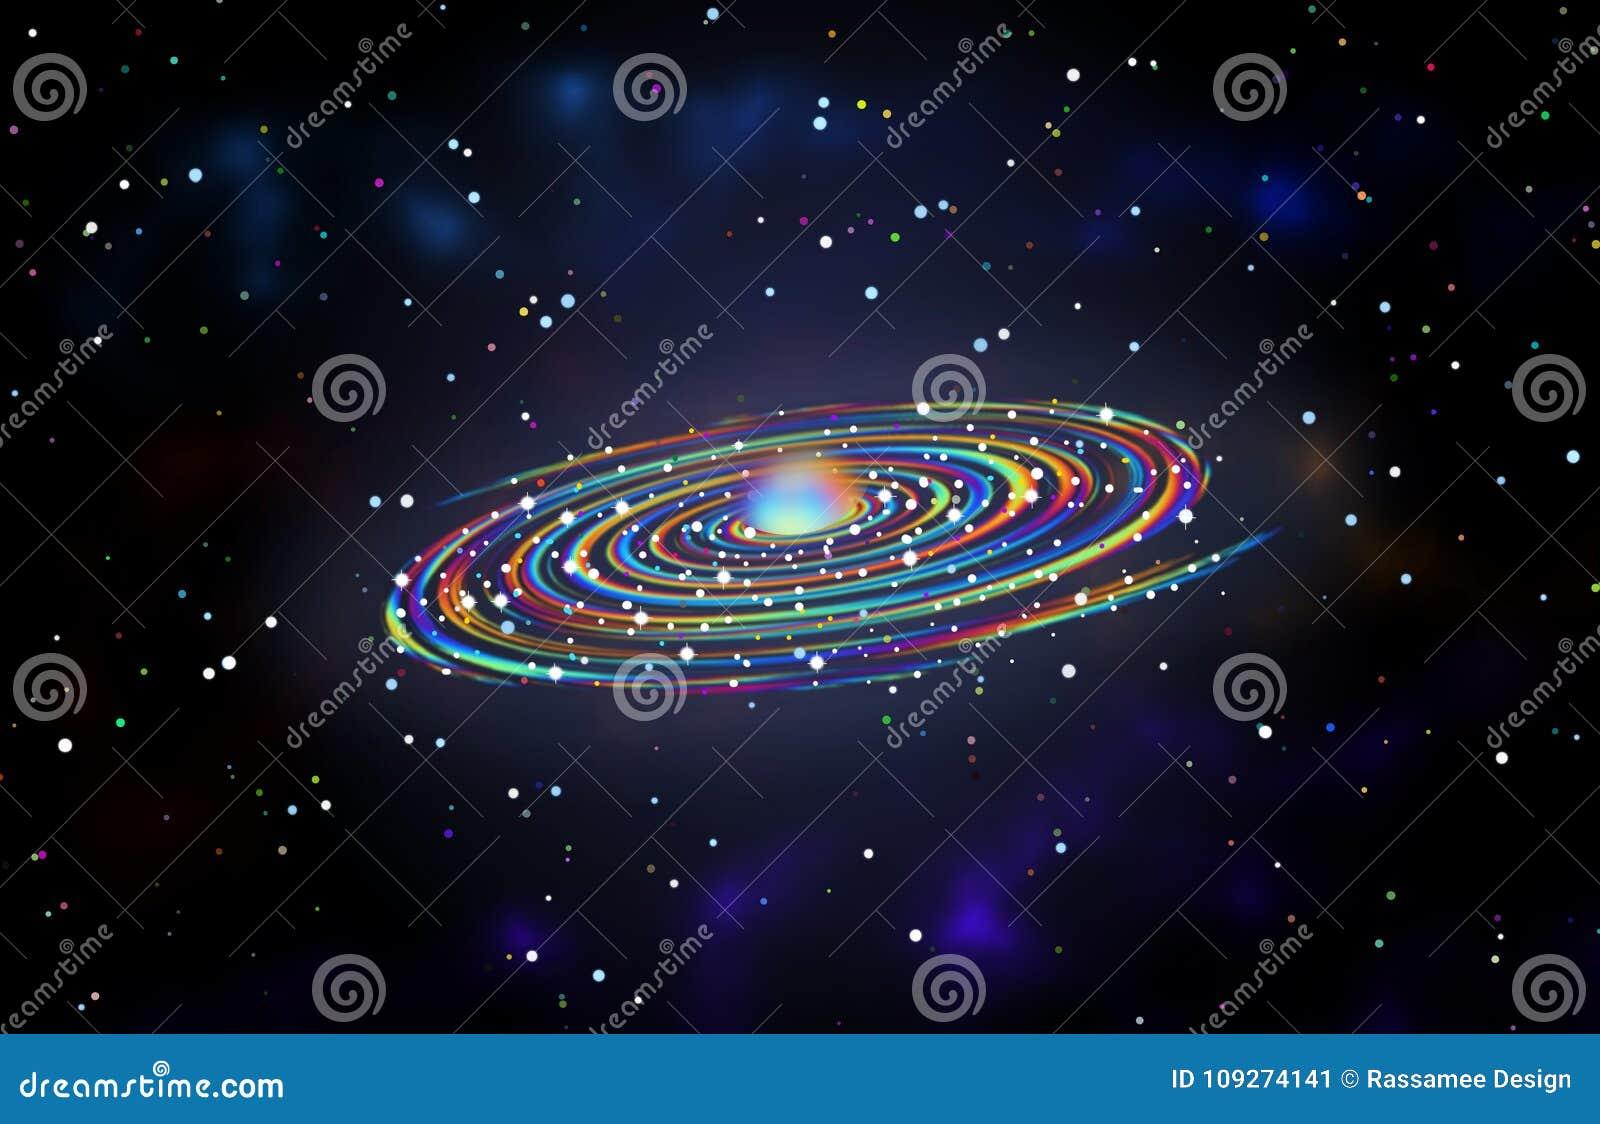 spiral rainbow galaxy theme graphic design background stock